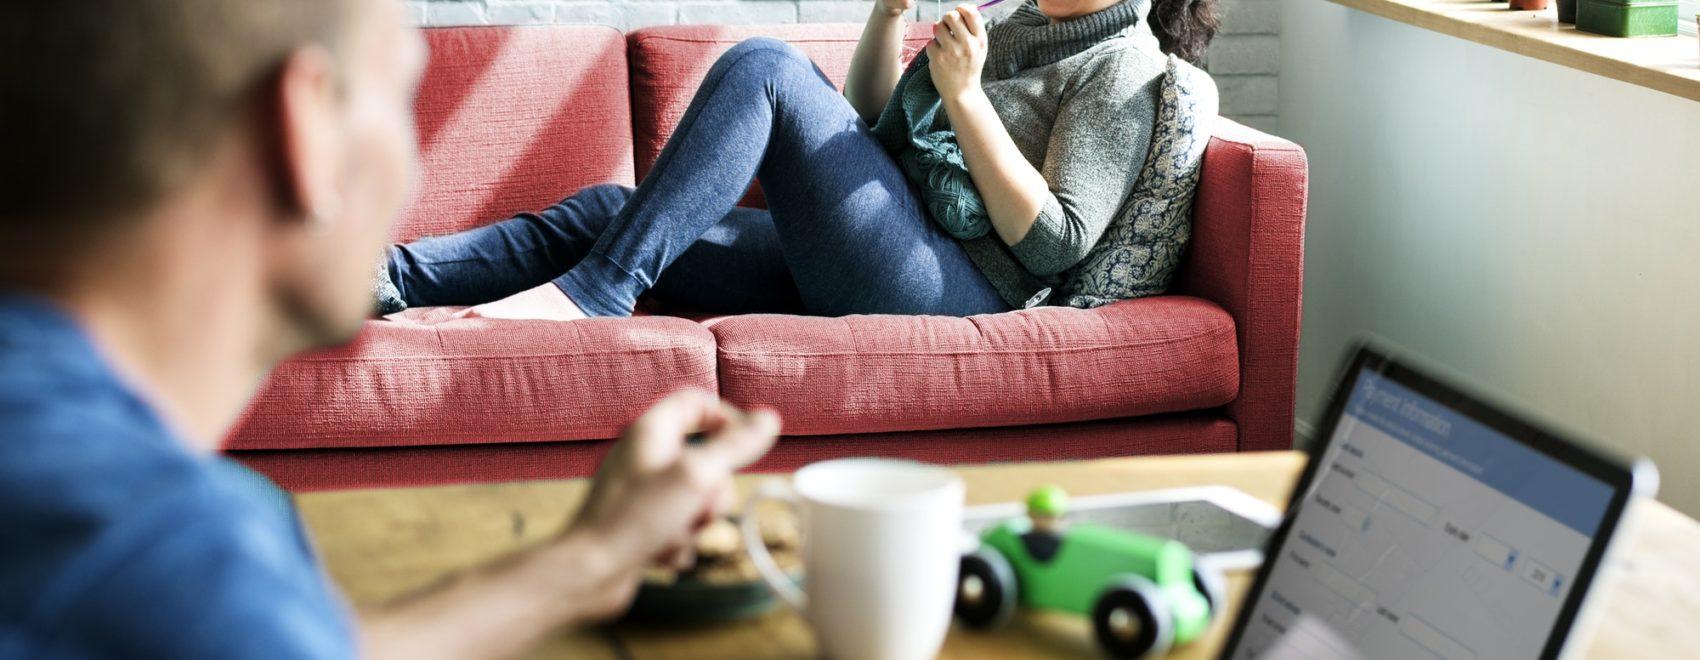 Couple Wife Husband Relax Customer Browsing